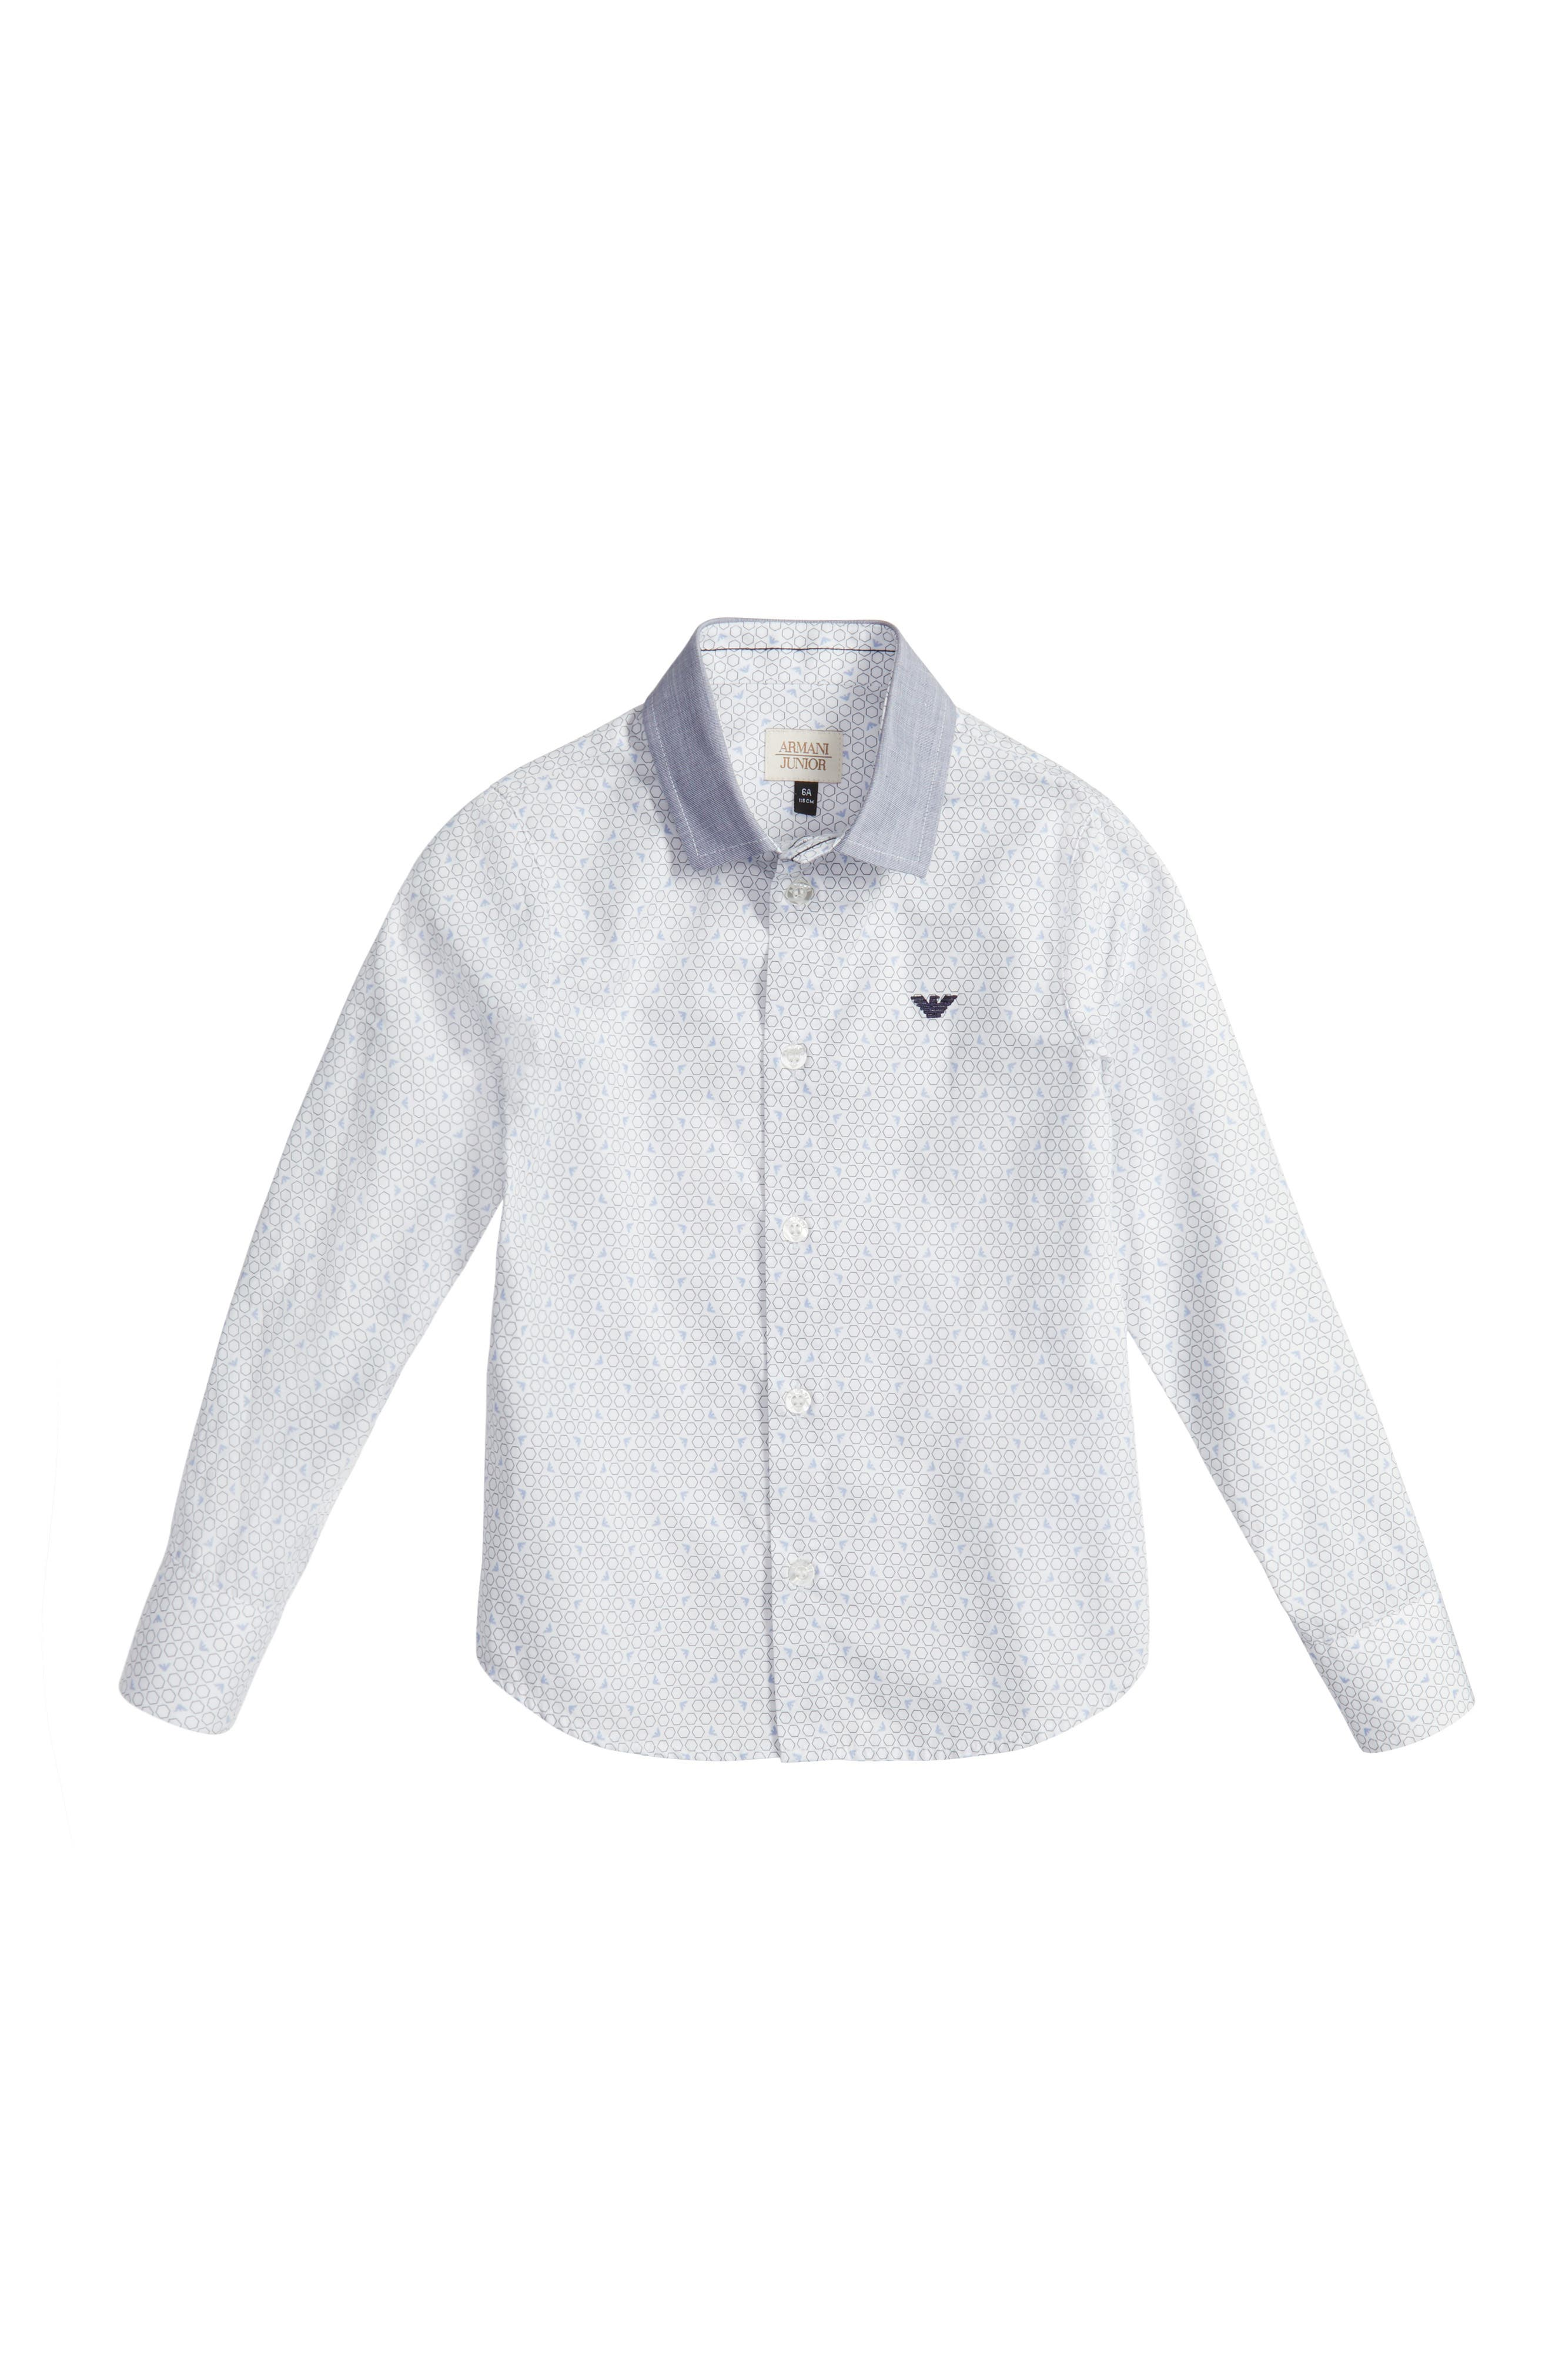 Alternate Image 1 Selected - Armani Junior Geo Print Dress Shirt (Little Boys & Big Boys)